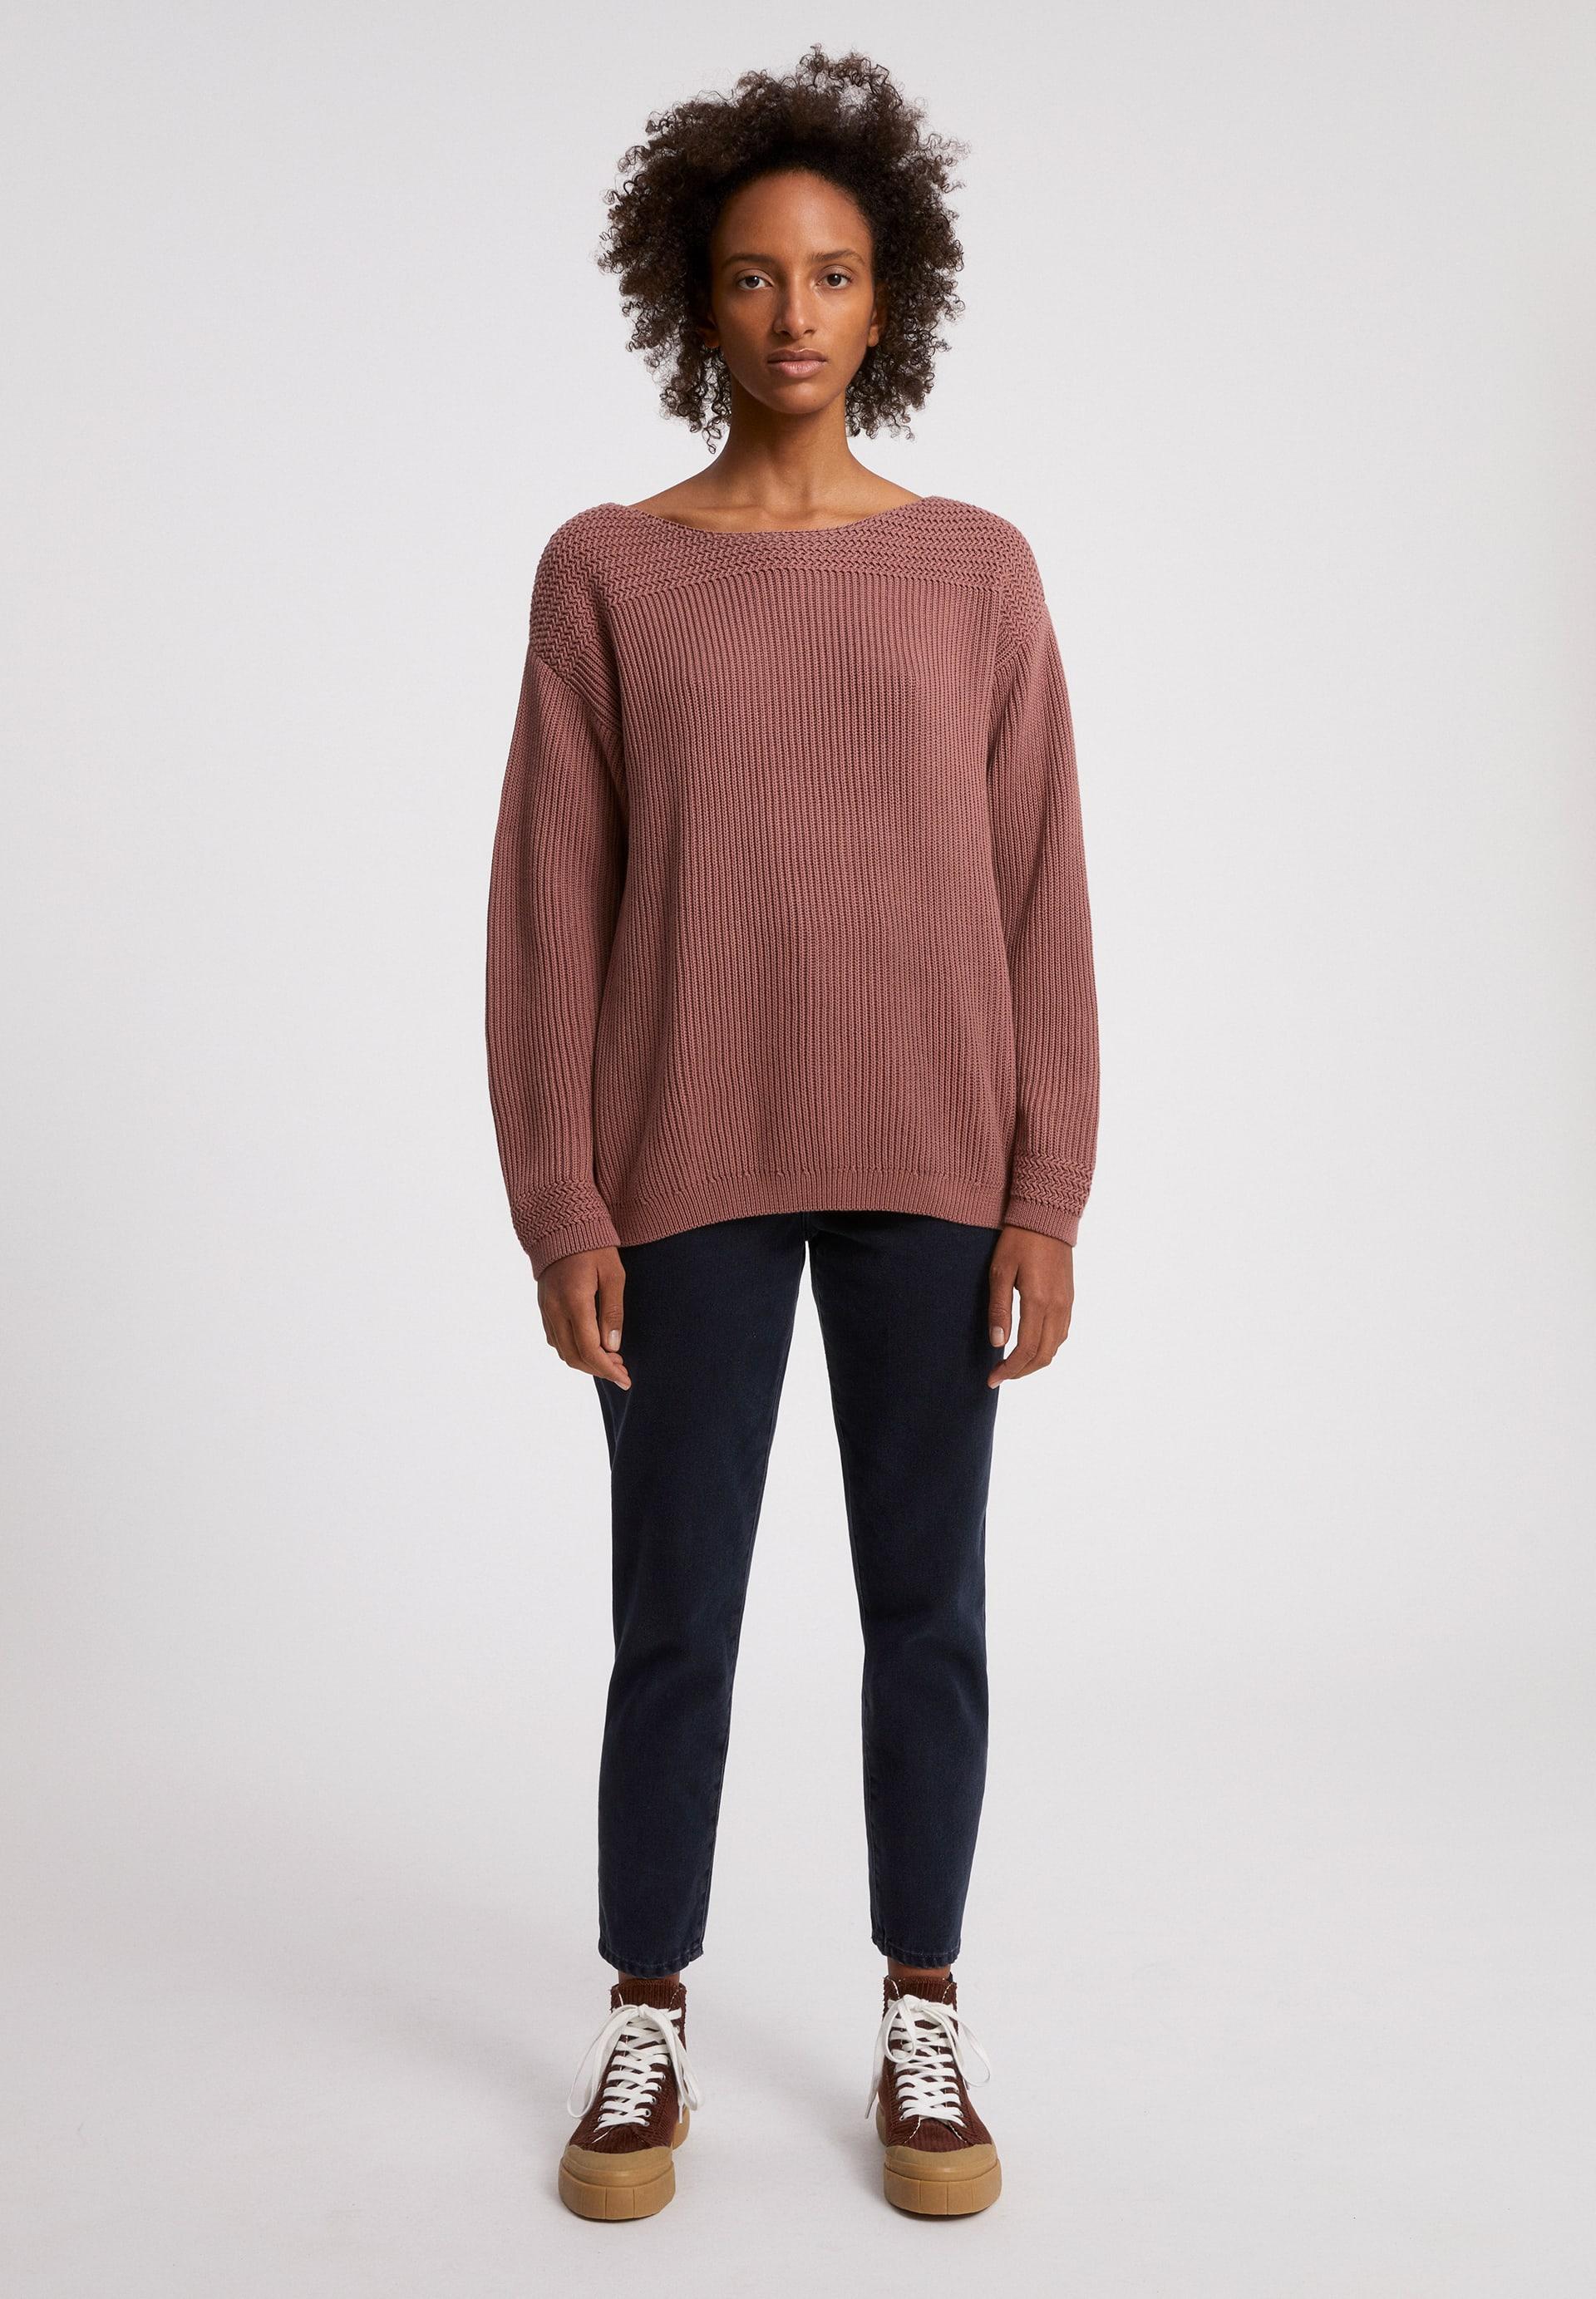 RAACHELA EARTHCOLORS® Pullover aus Bio-Baumwolle